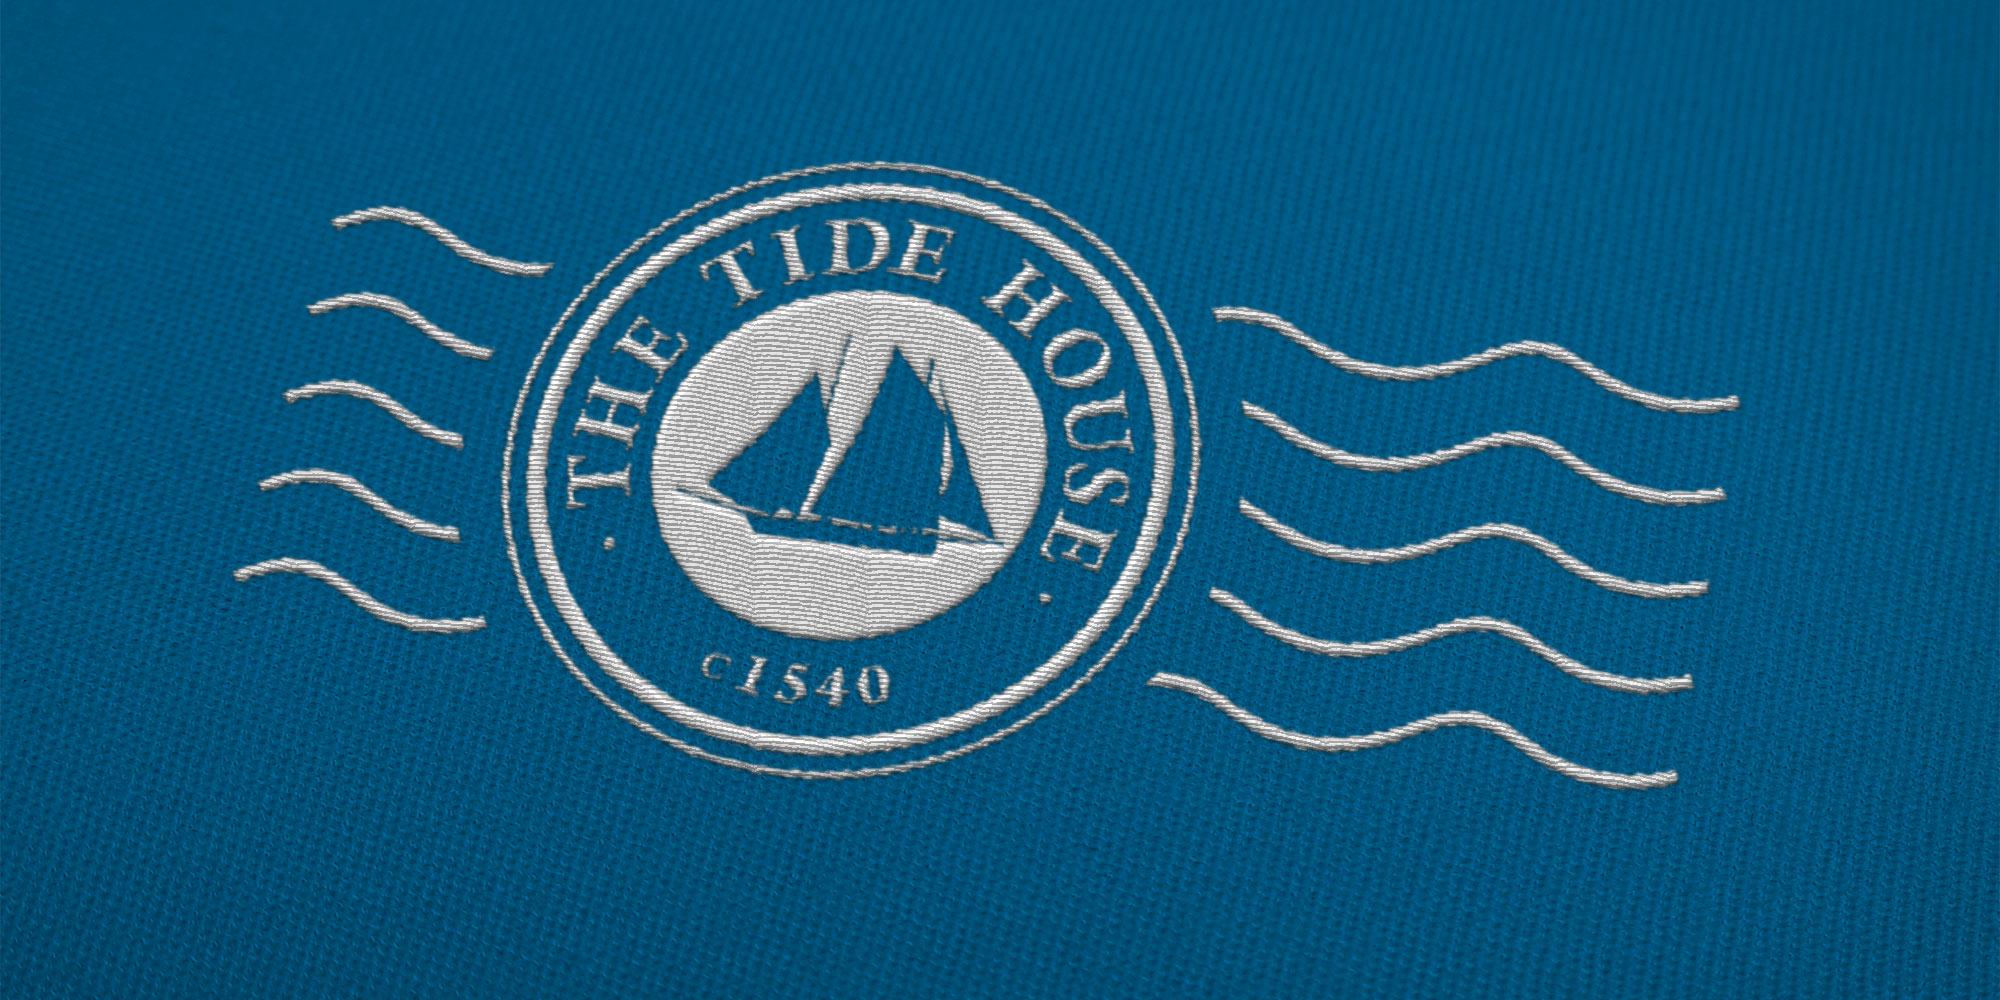 The Tide House Logo Design on Uniform